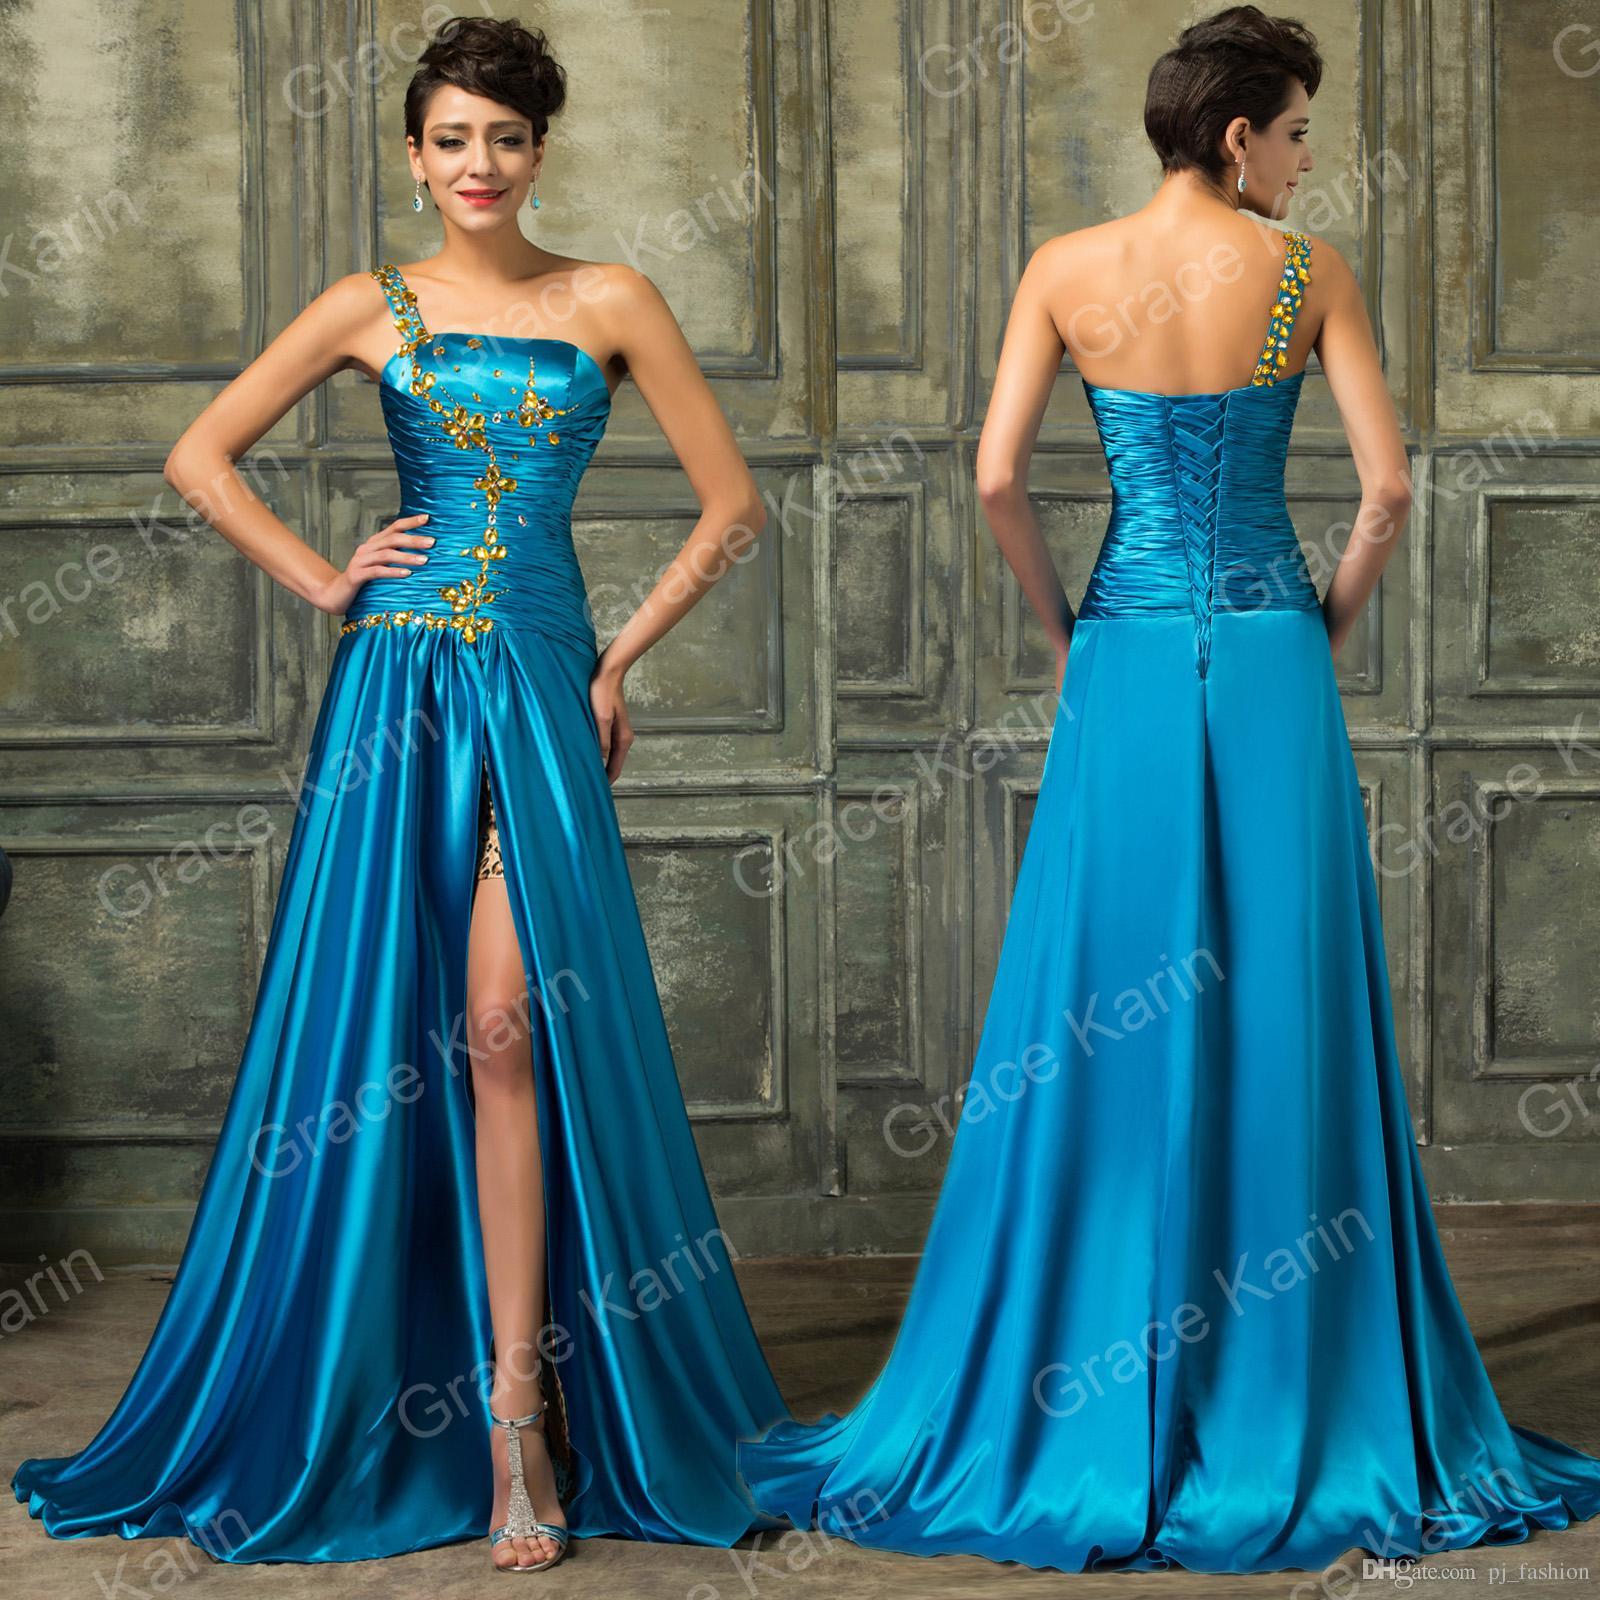 Enchanting Goodwill Prom Dresses Ideas - All Wedding Dresses ...